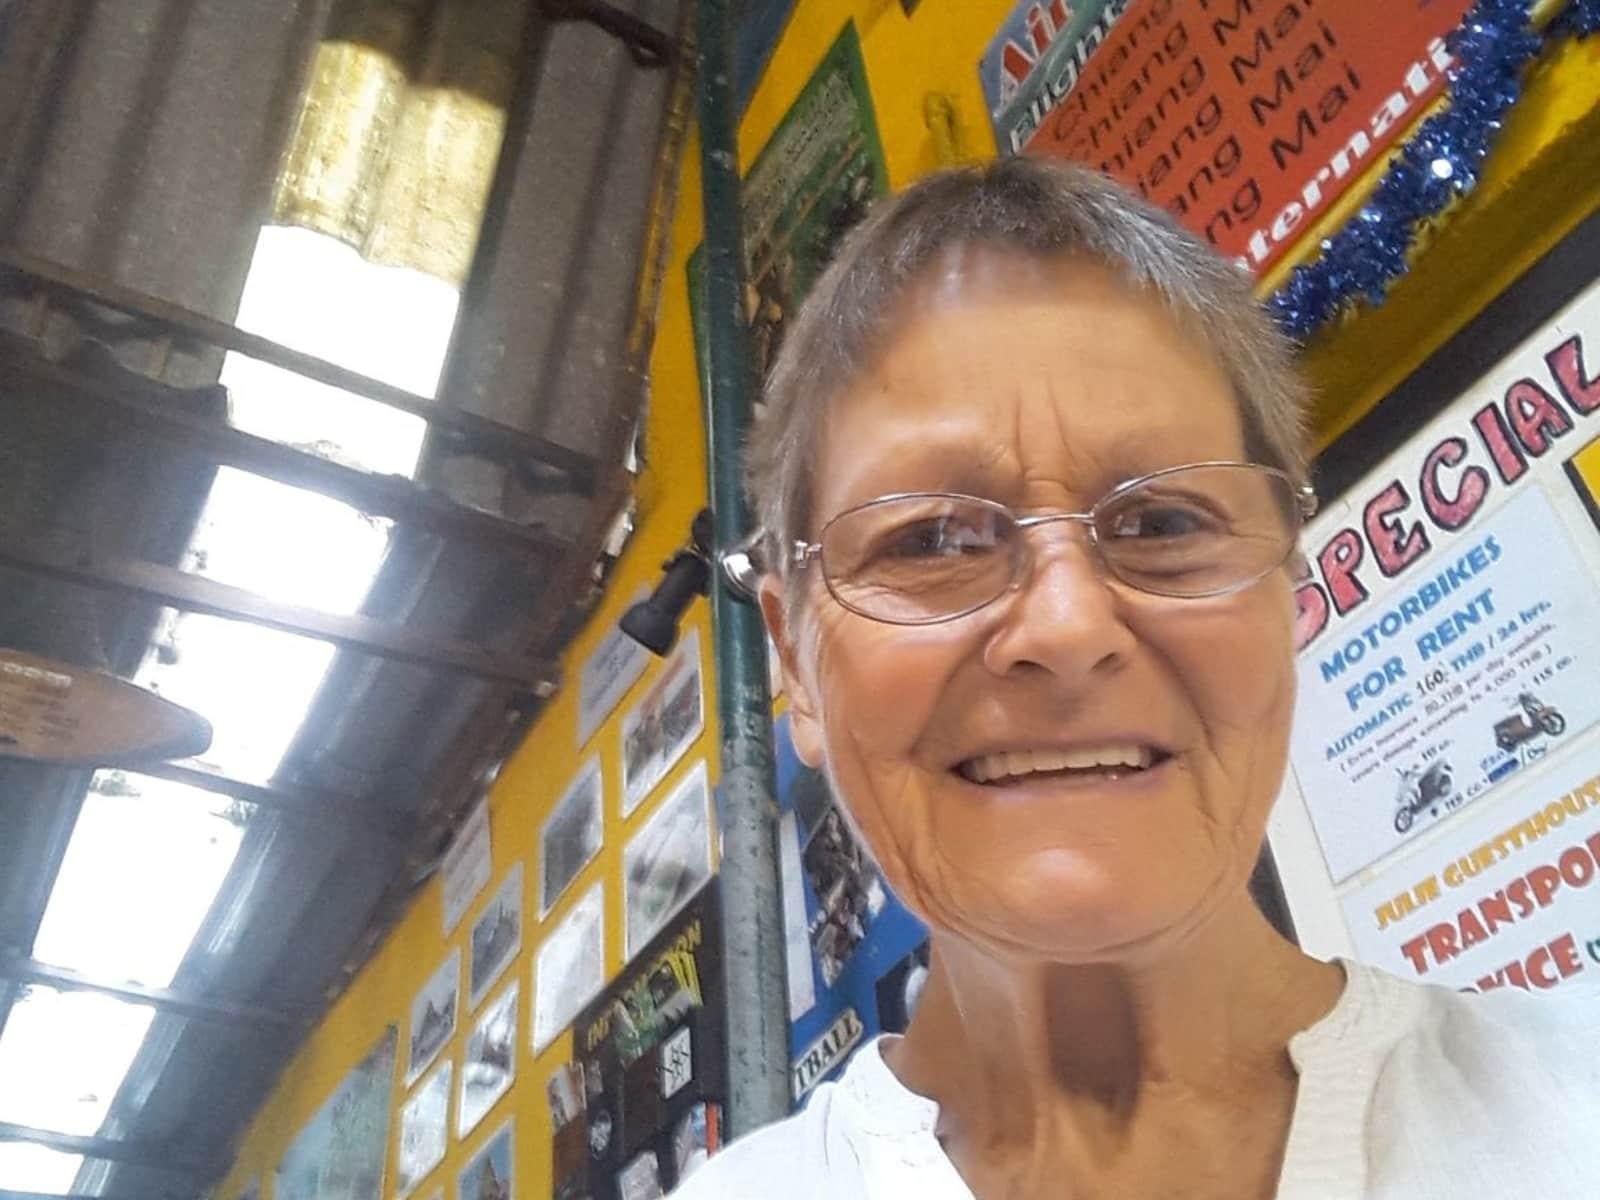 Ruth from Ballarat Central, Victoria, Australia